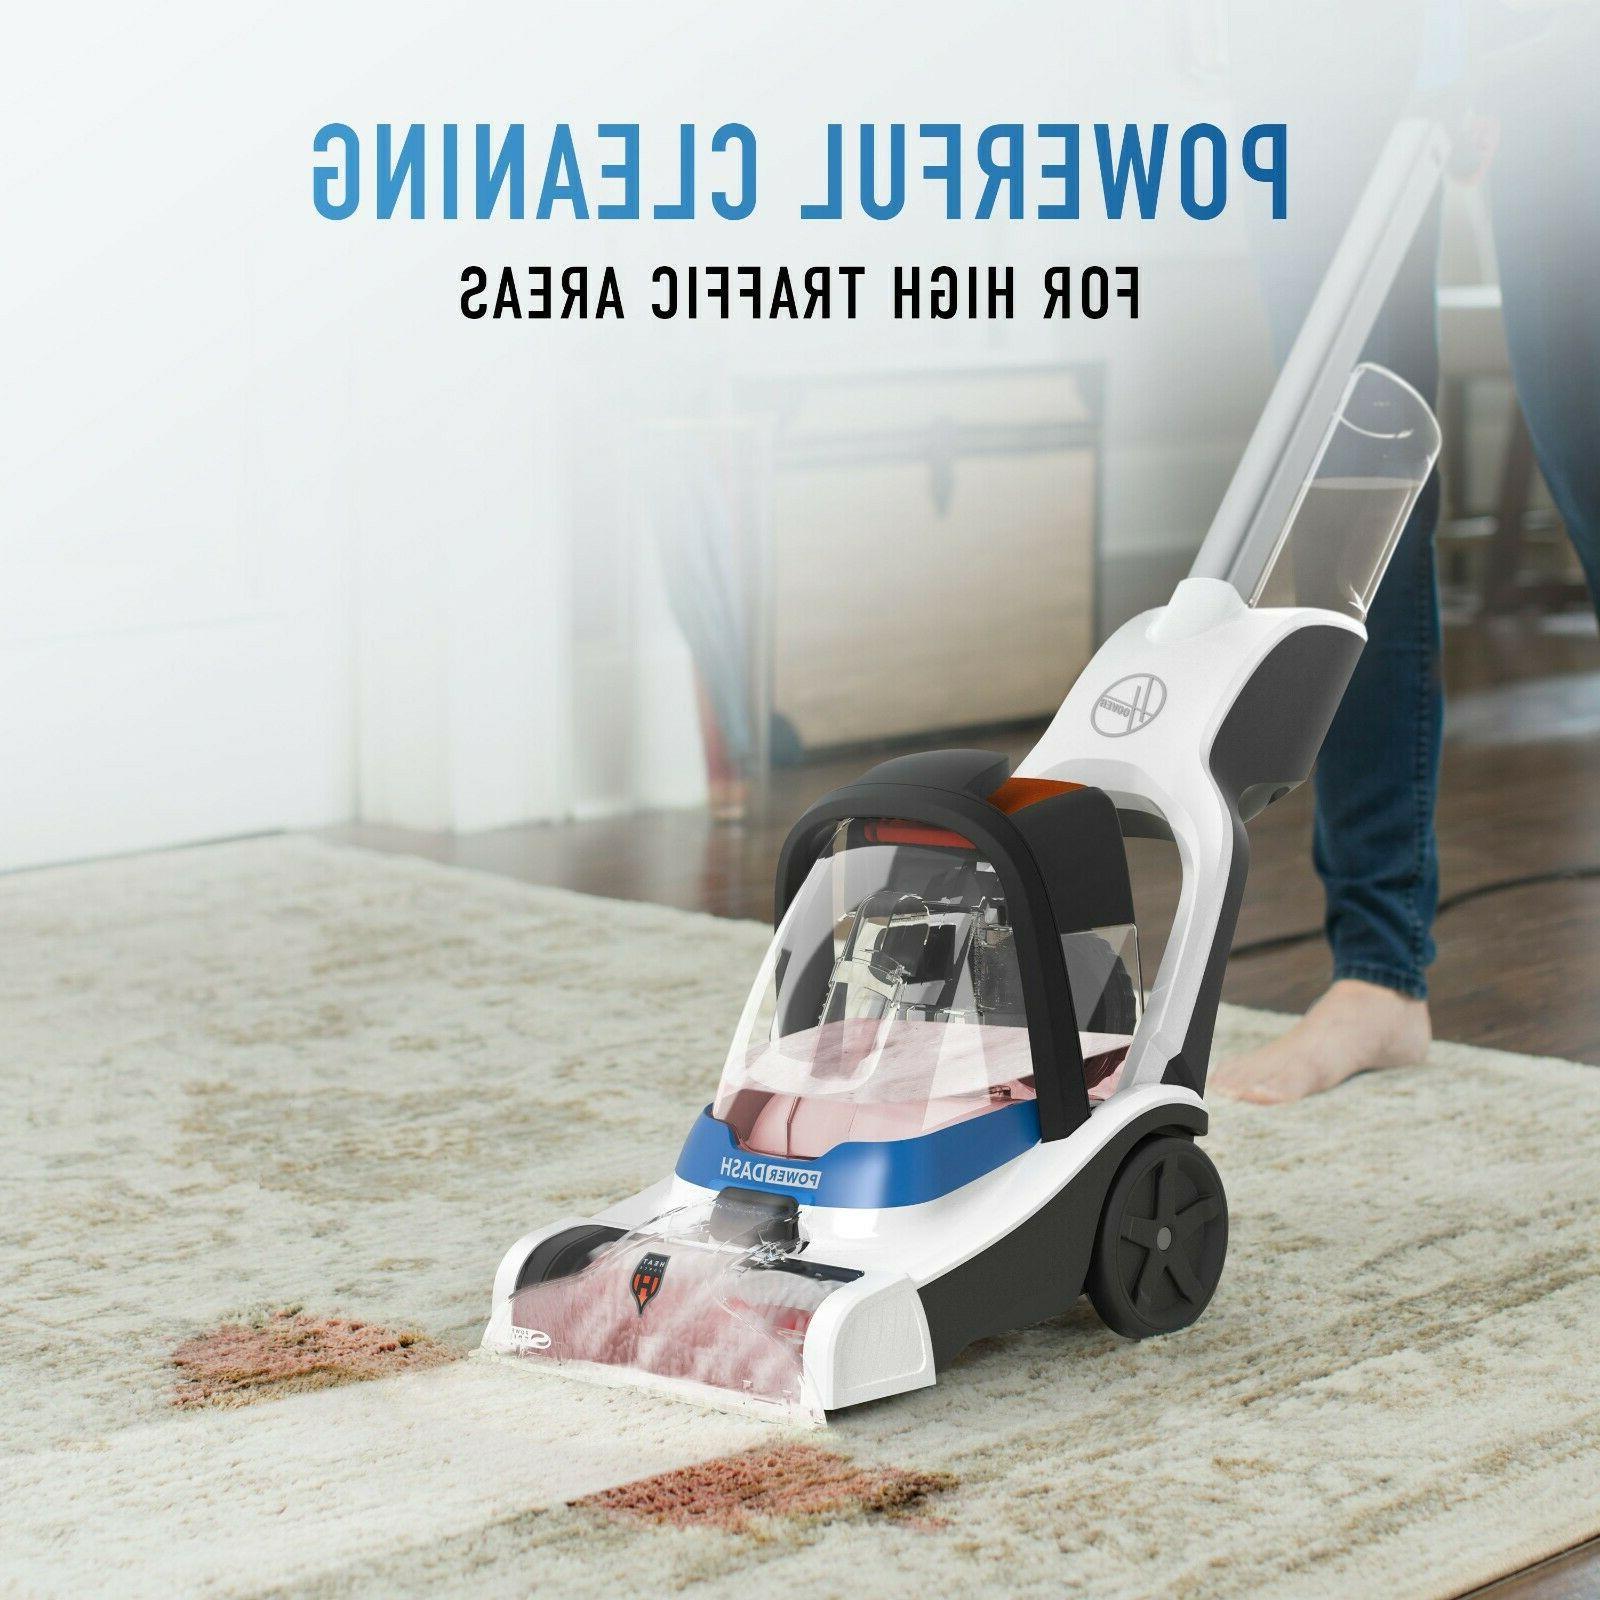 powerdash pet compact carpet cleaner fh50700us shampooer